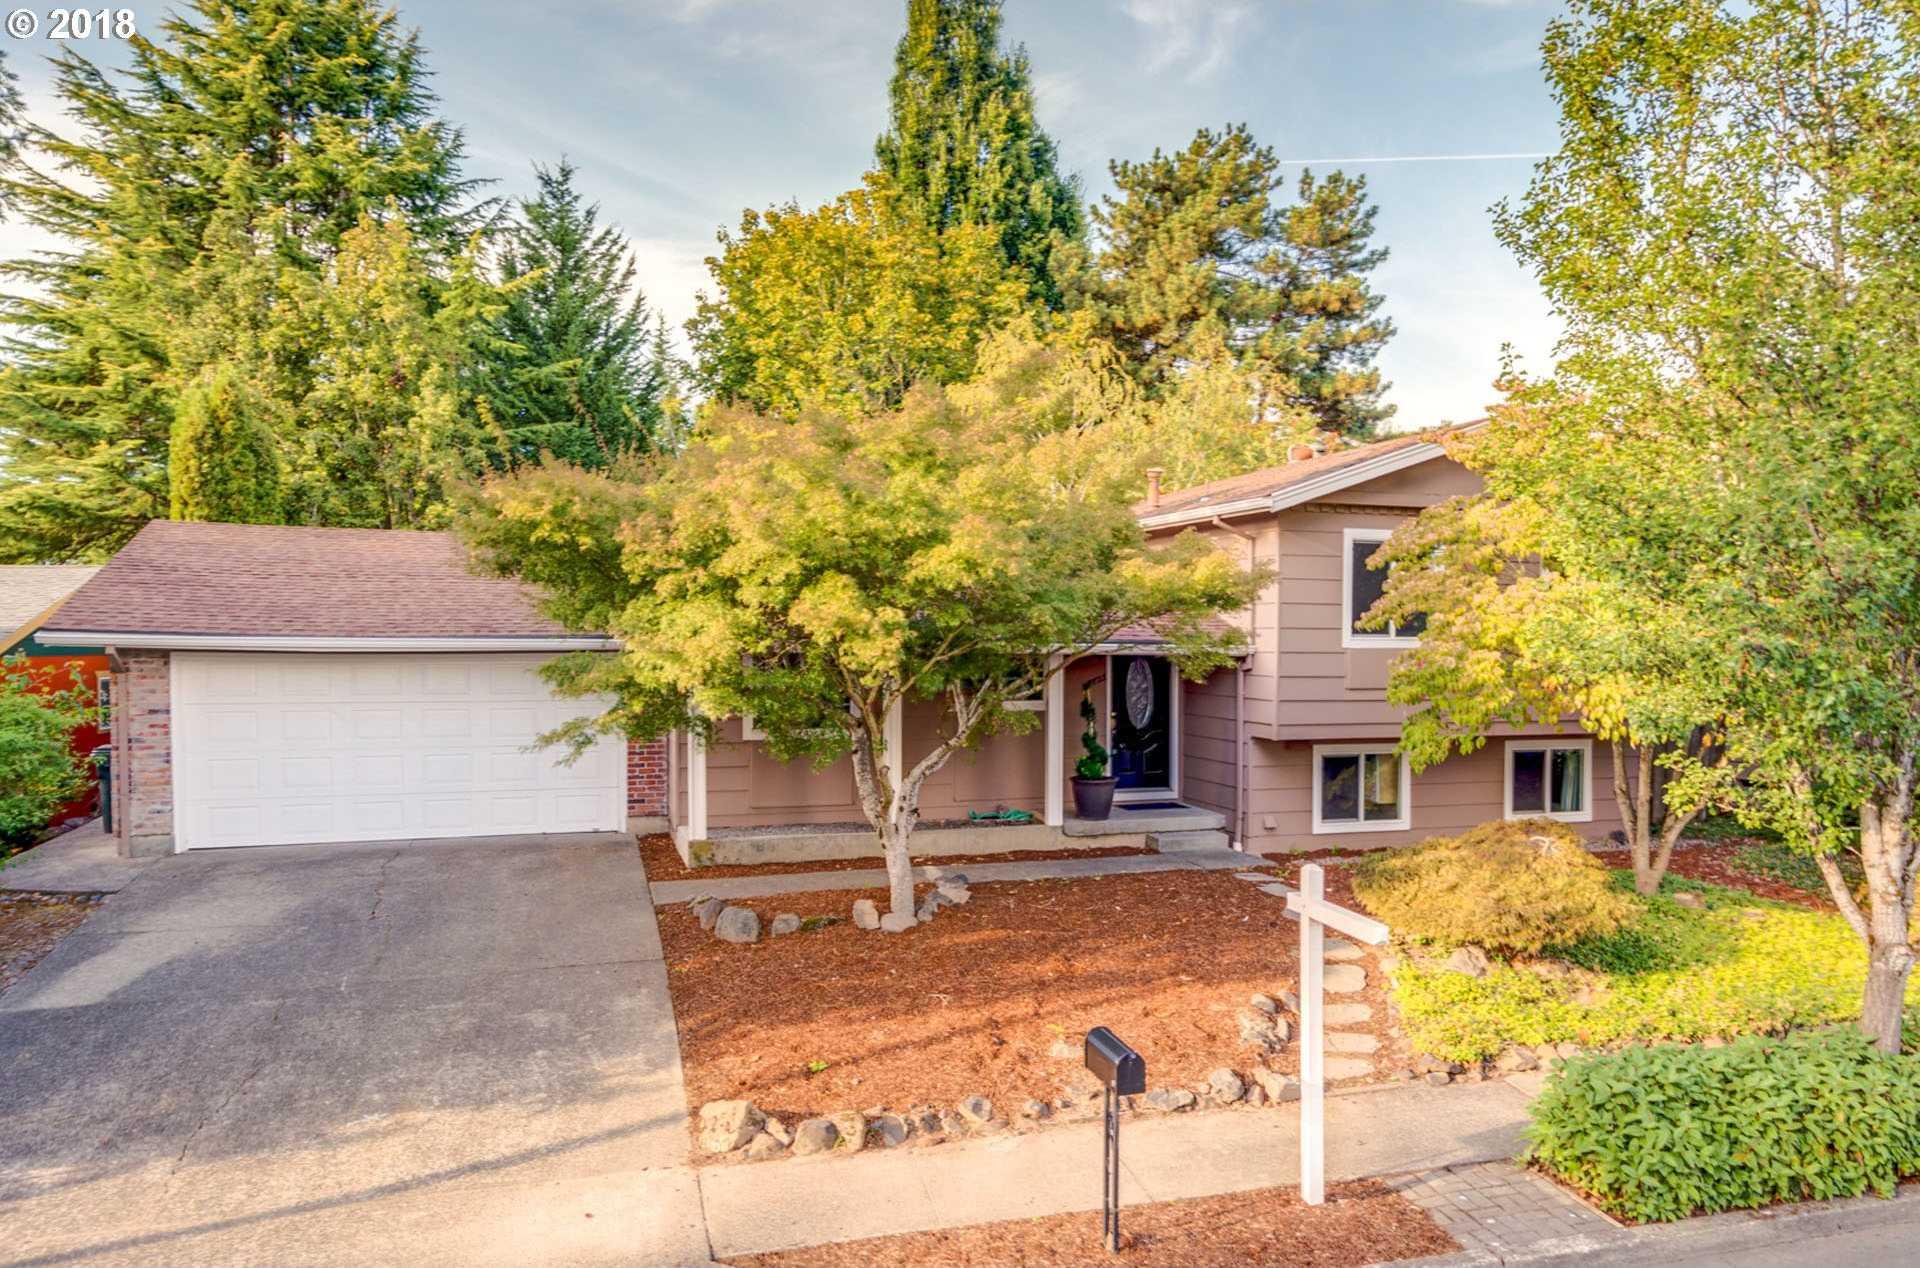 $449,000 - 4Br/3Ba -  for Sale in Sommerset West-elmonica N, Portland